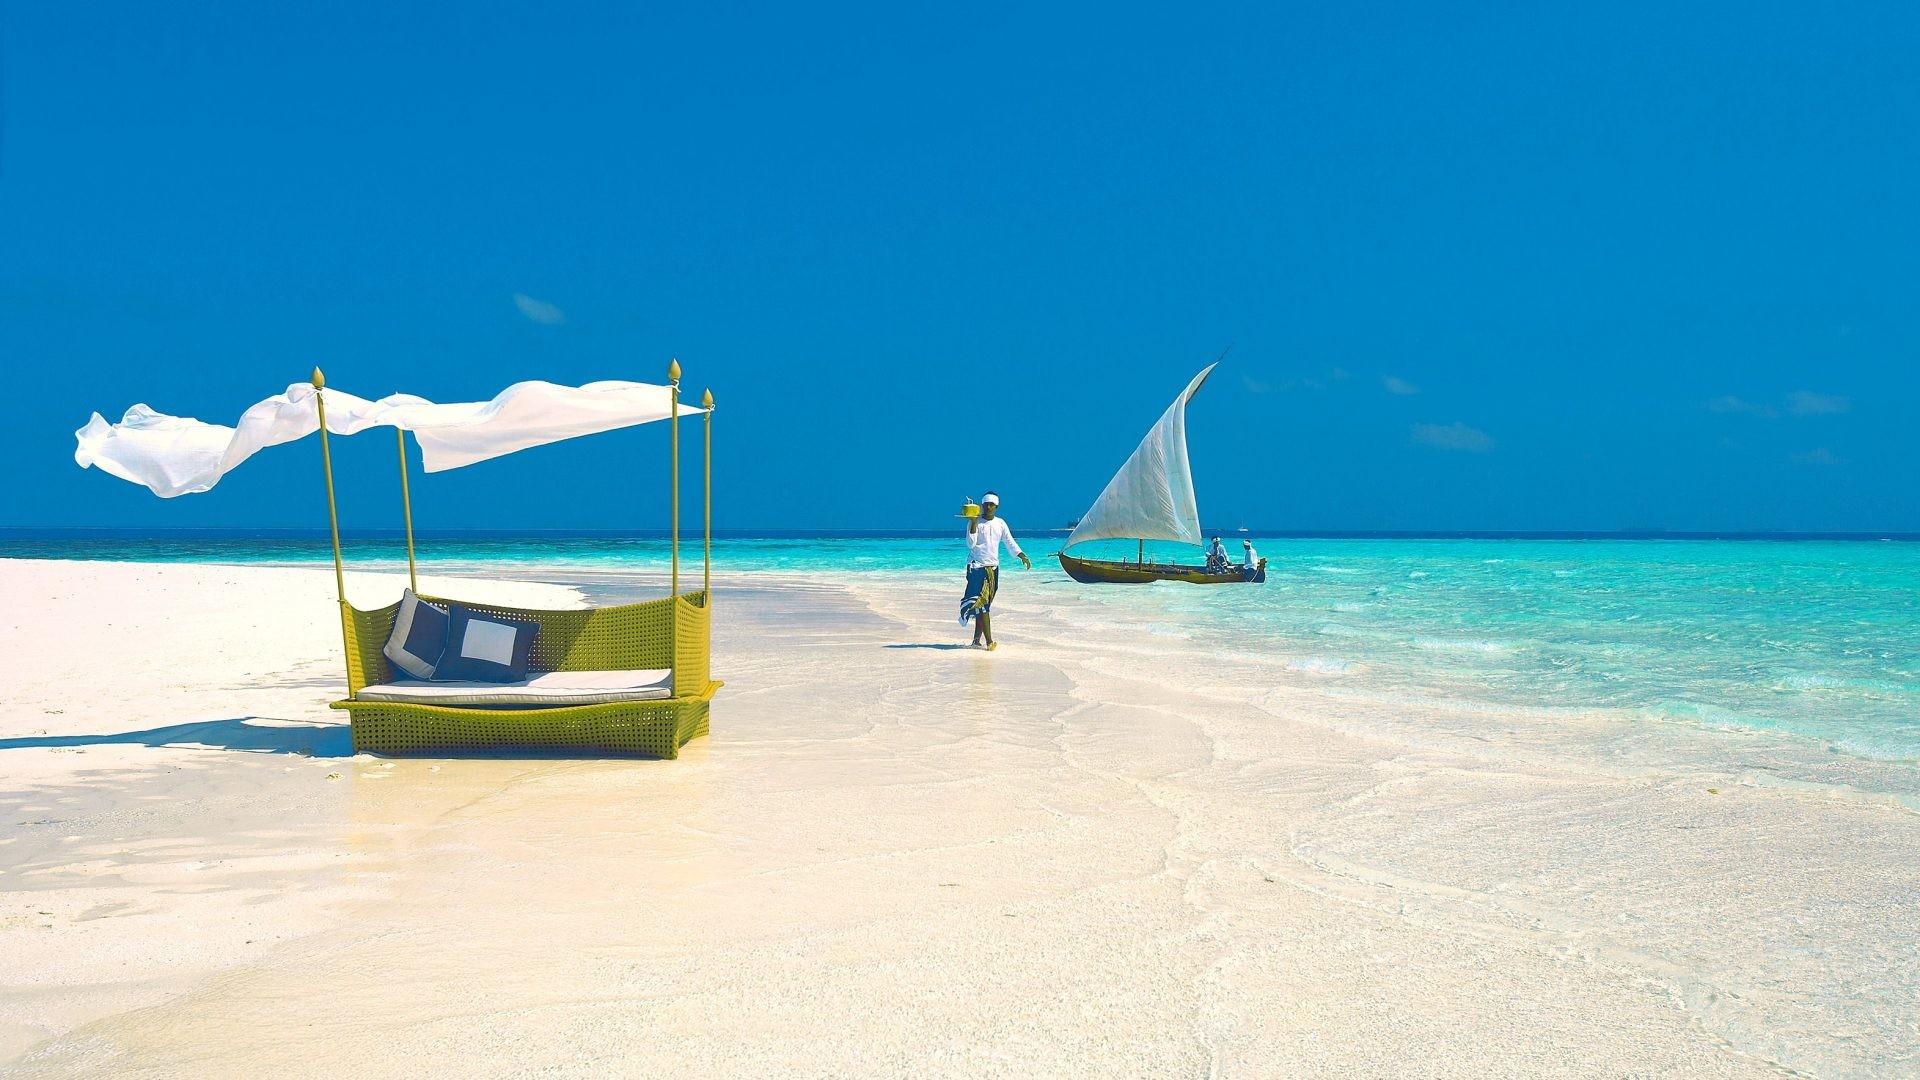 Beaches – Nature Sky Maldives Beach Ocean Blue HD Picture for HD 16:9 High